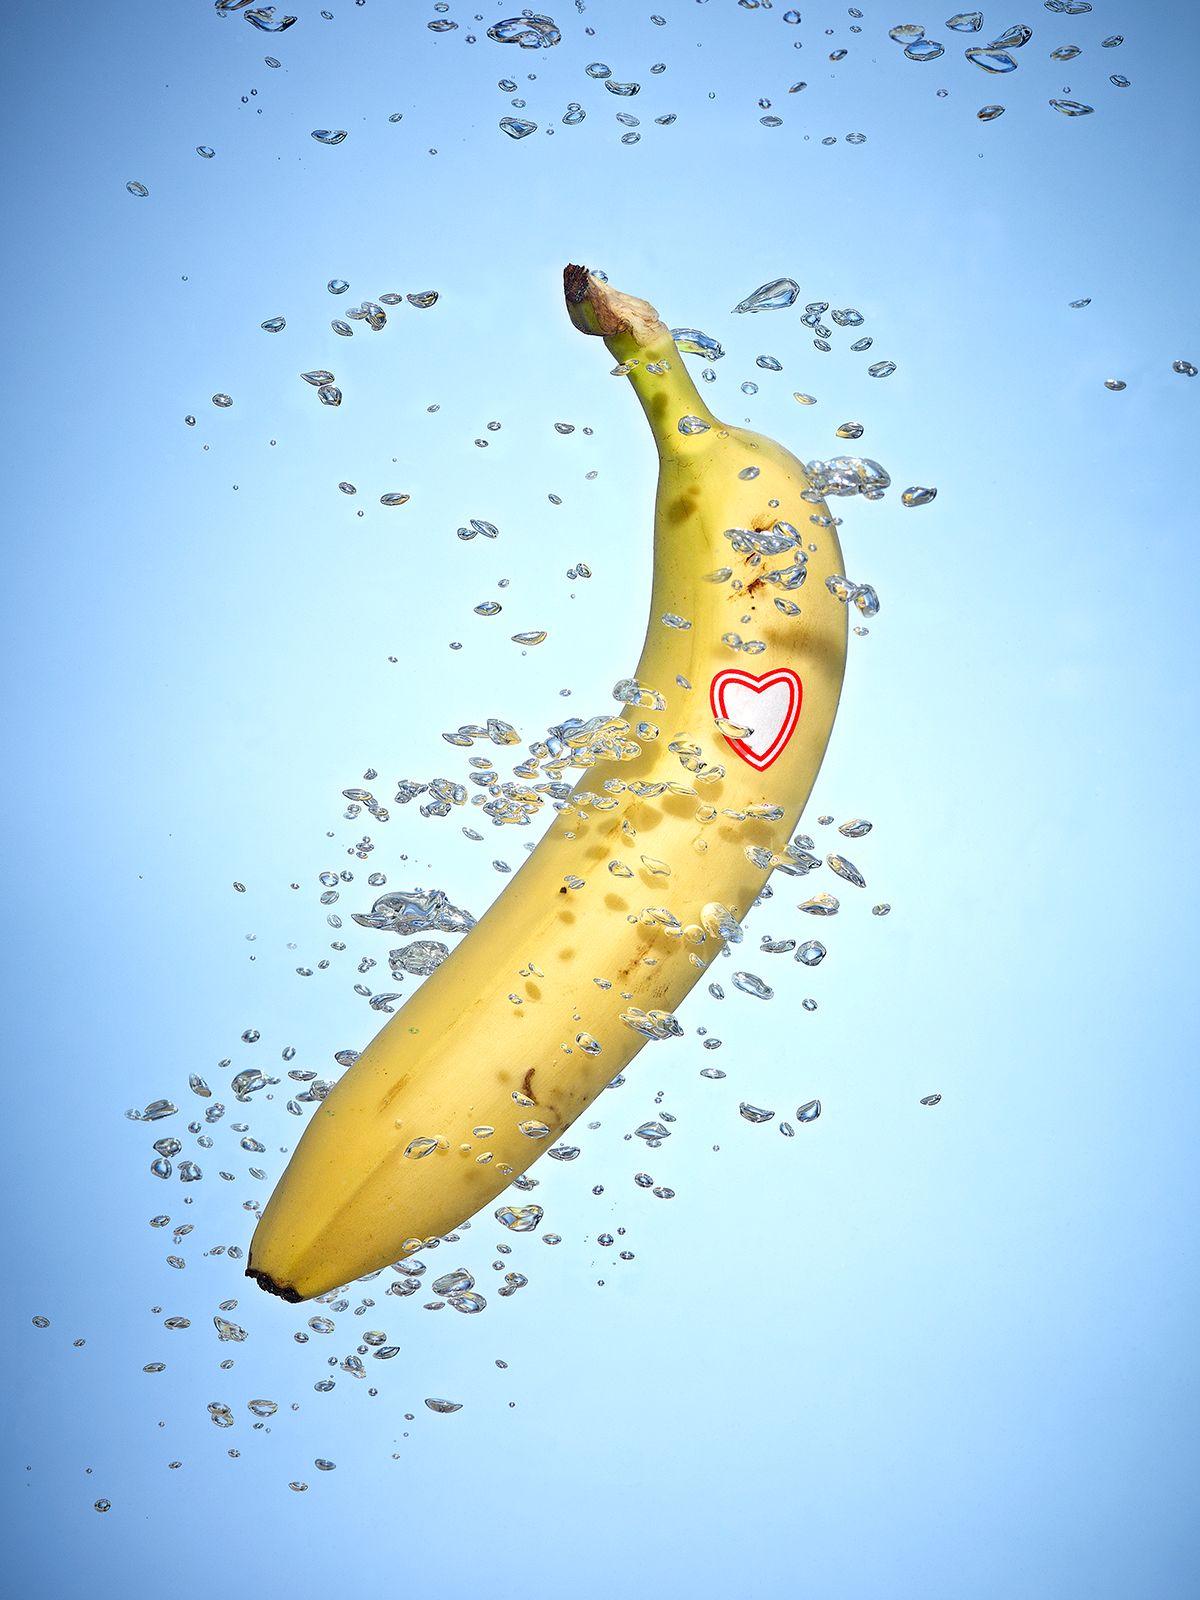 Discoveries_Banana_FINAL_Workbook.jpg